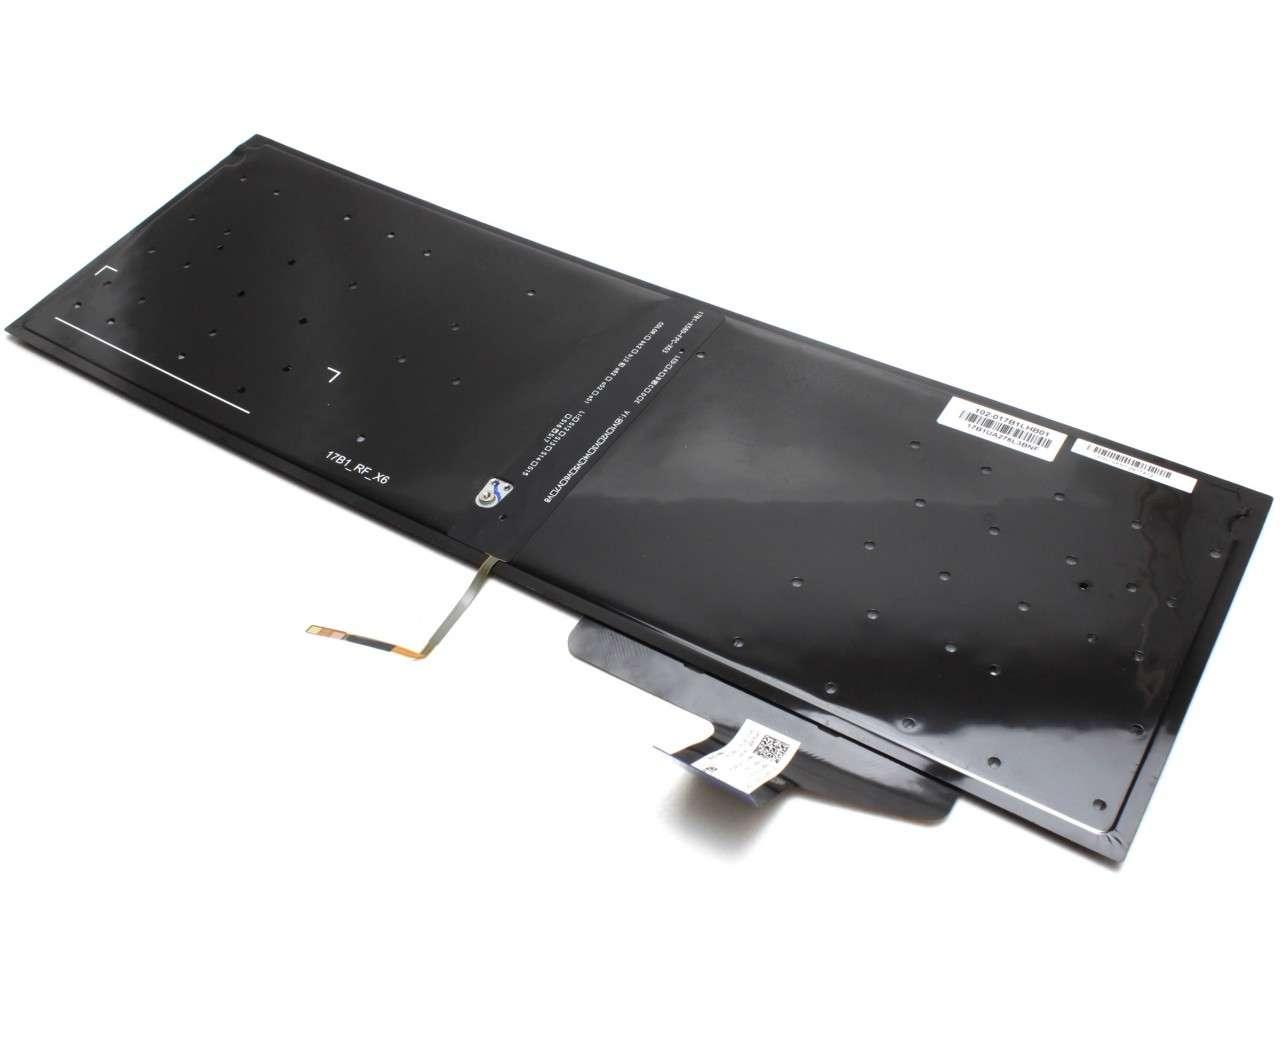 Tastatura Asus VivoBook NX580 iluminata layout US fara rama enter mic imagine powerlaptop.ro 2021